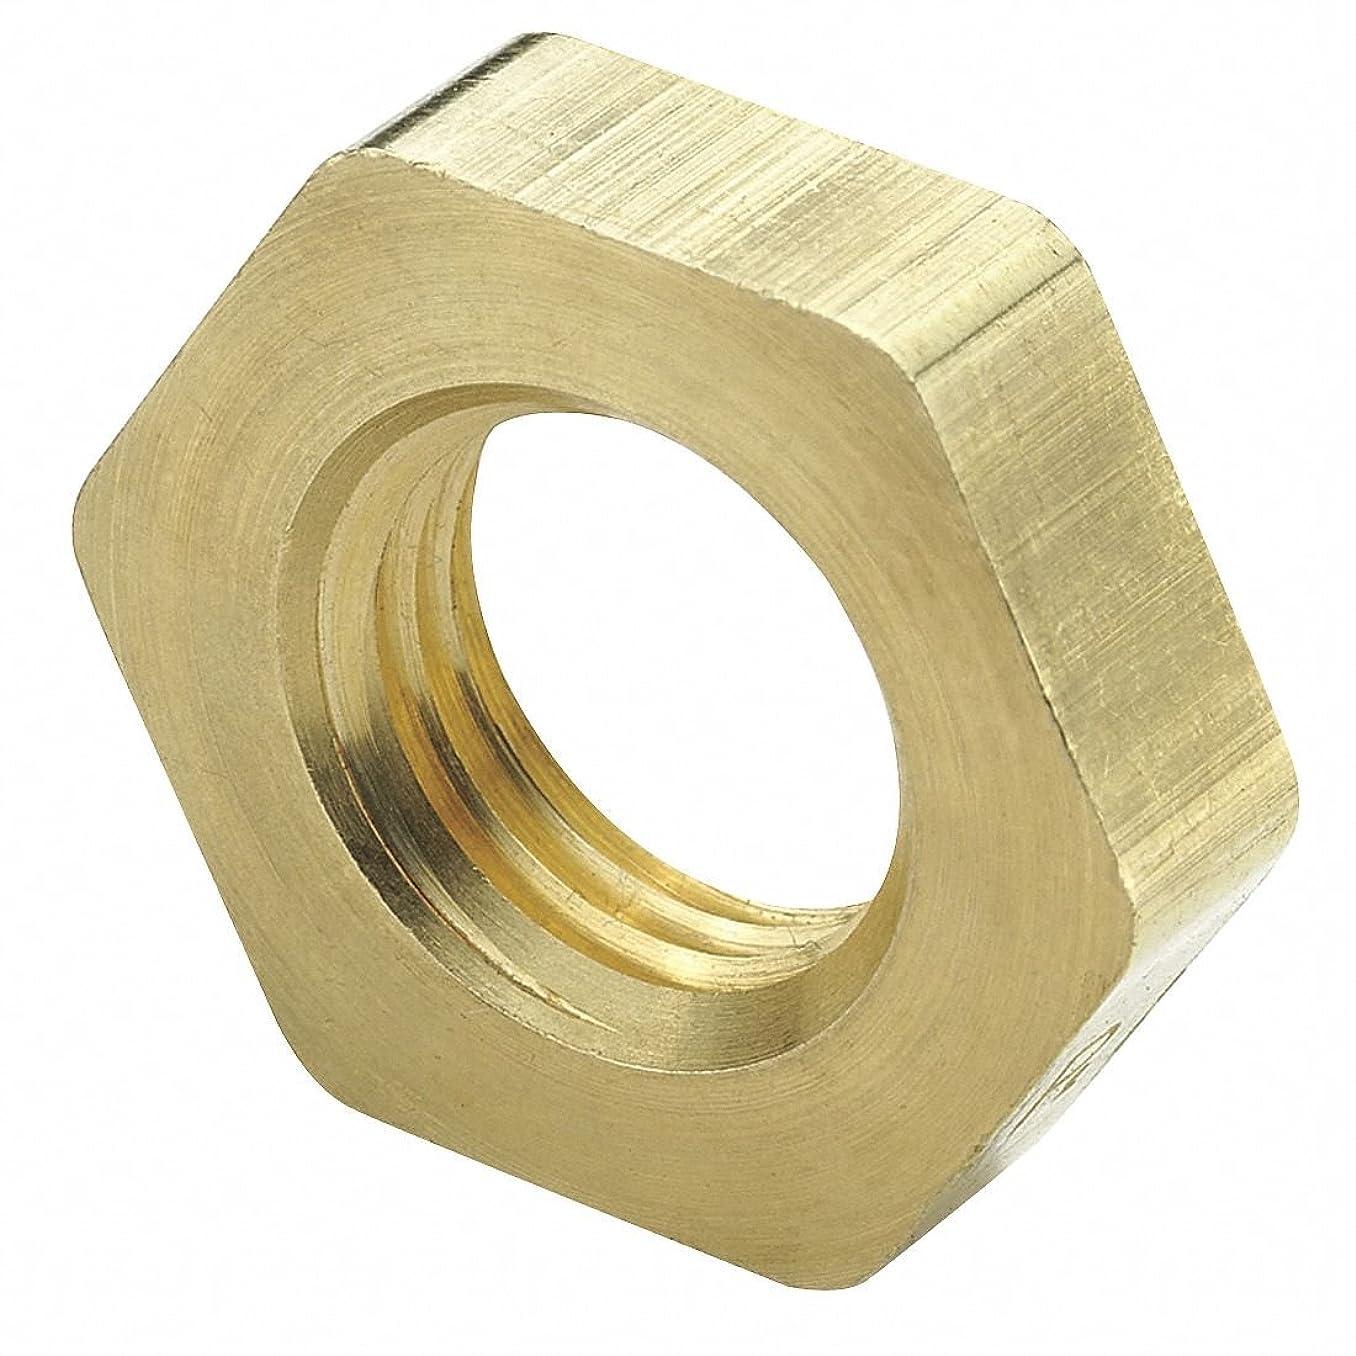 Parker Hannifin 210P-4 Brass Pipe Fitting Lock Nut, 1/4 NPSL Pipe Thread